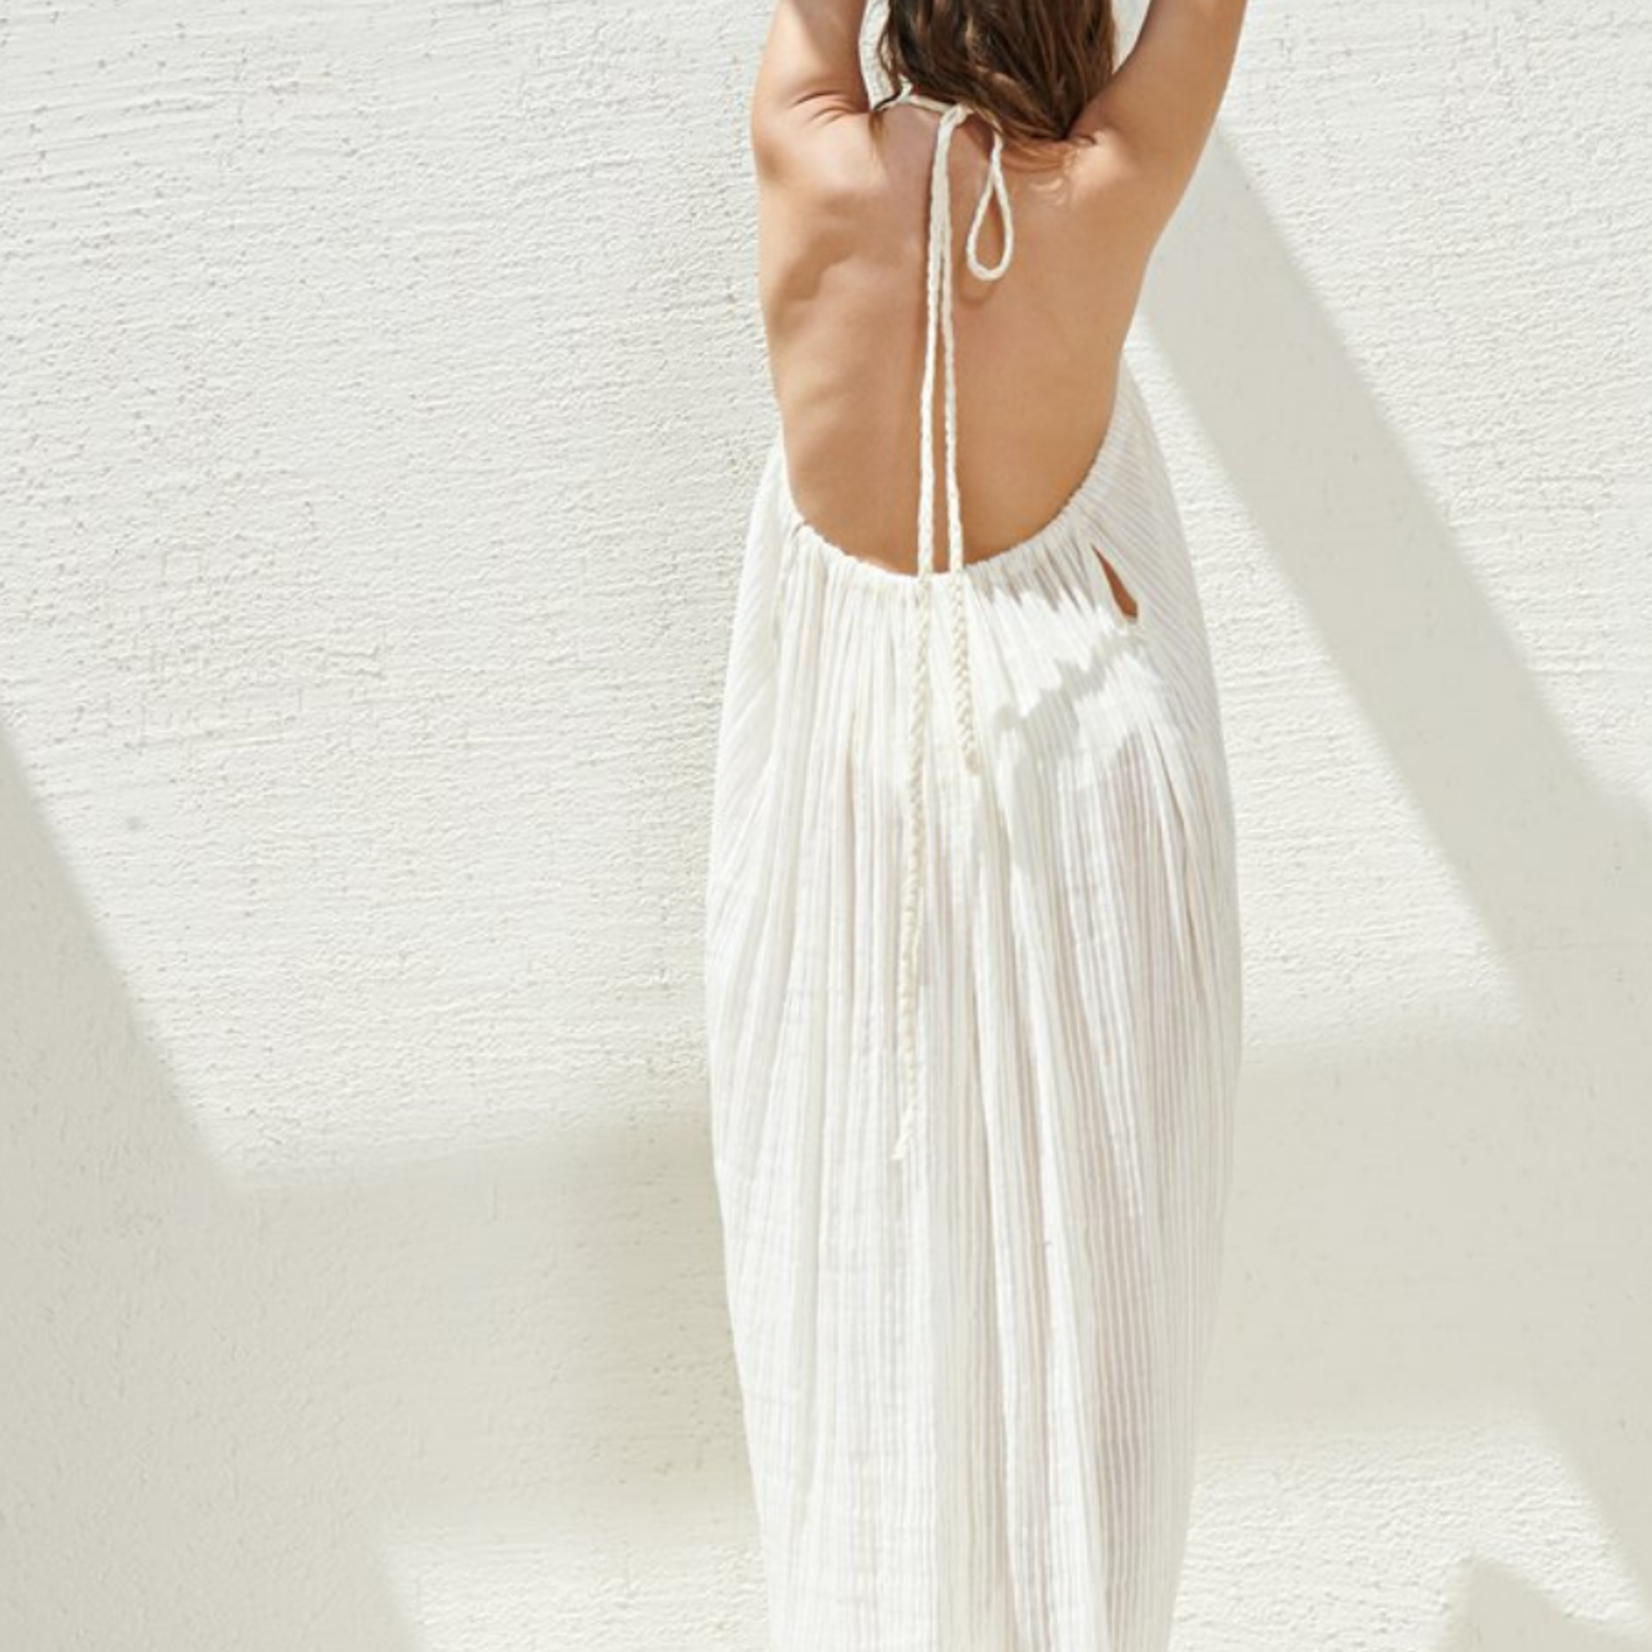 Handloom Breeze Beach Dress